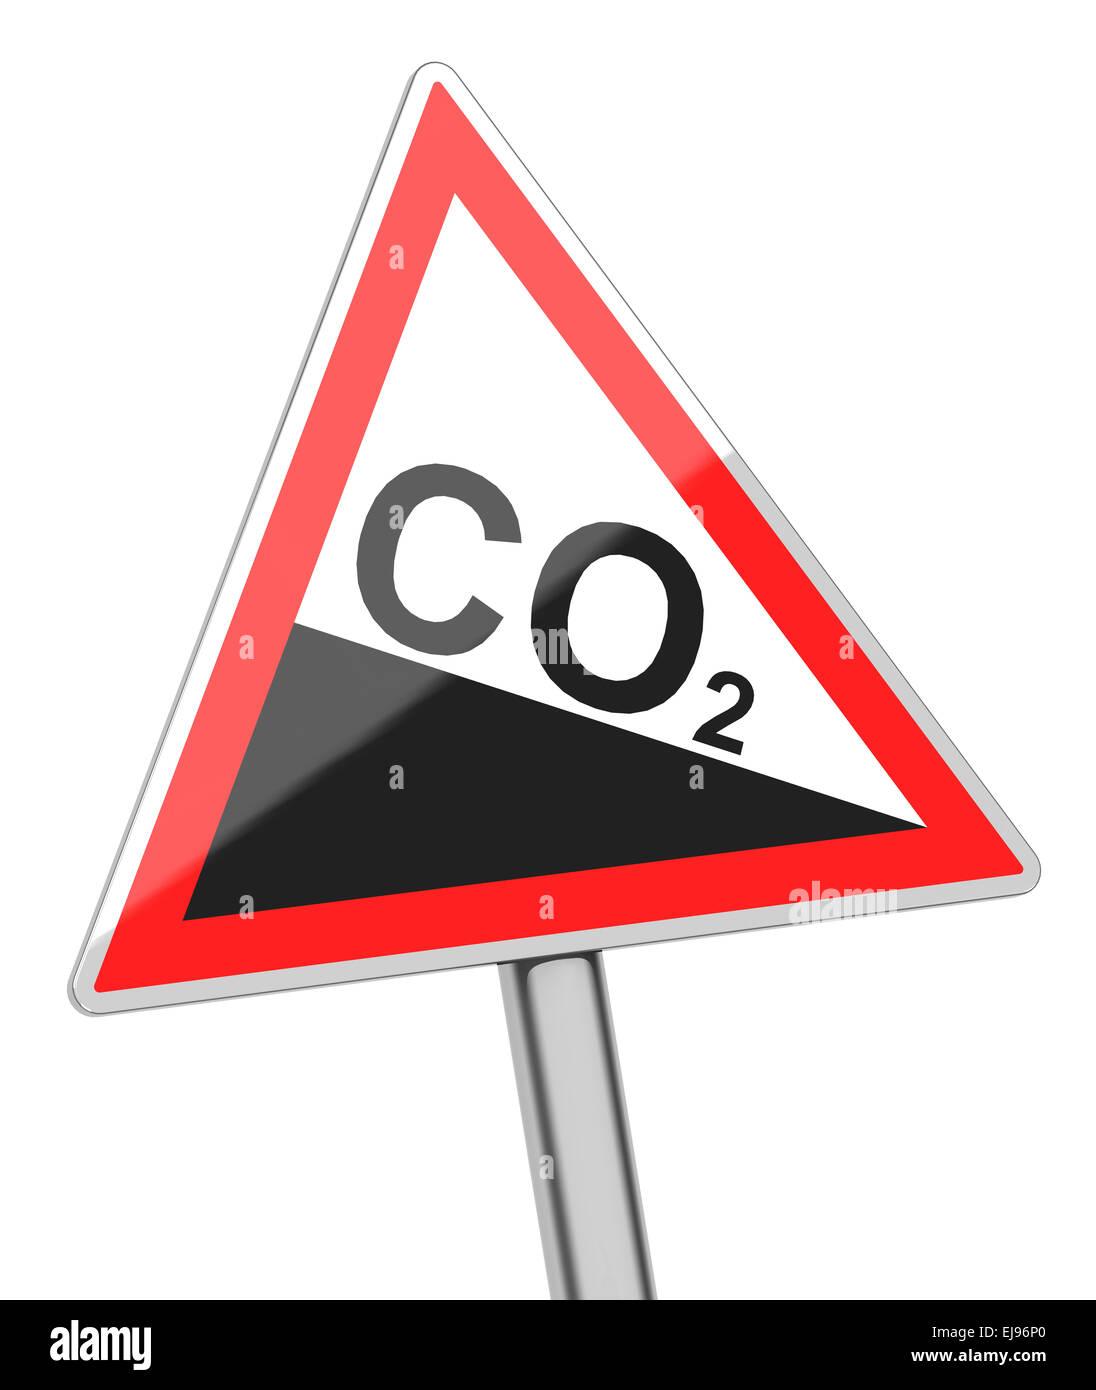 carbon dioxide sign - Stock Image